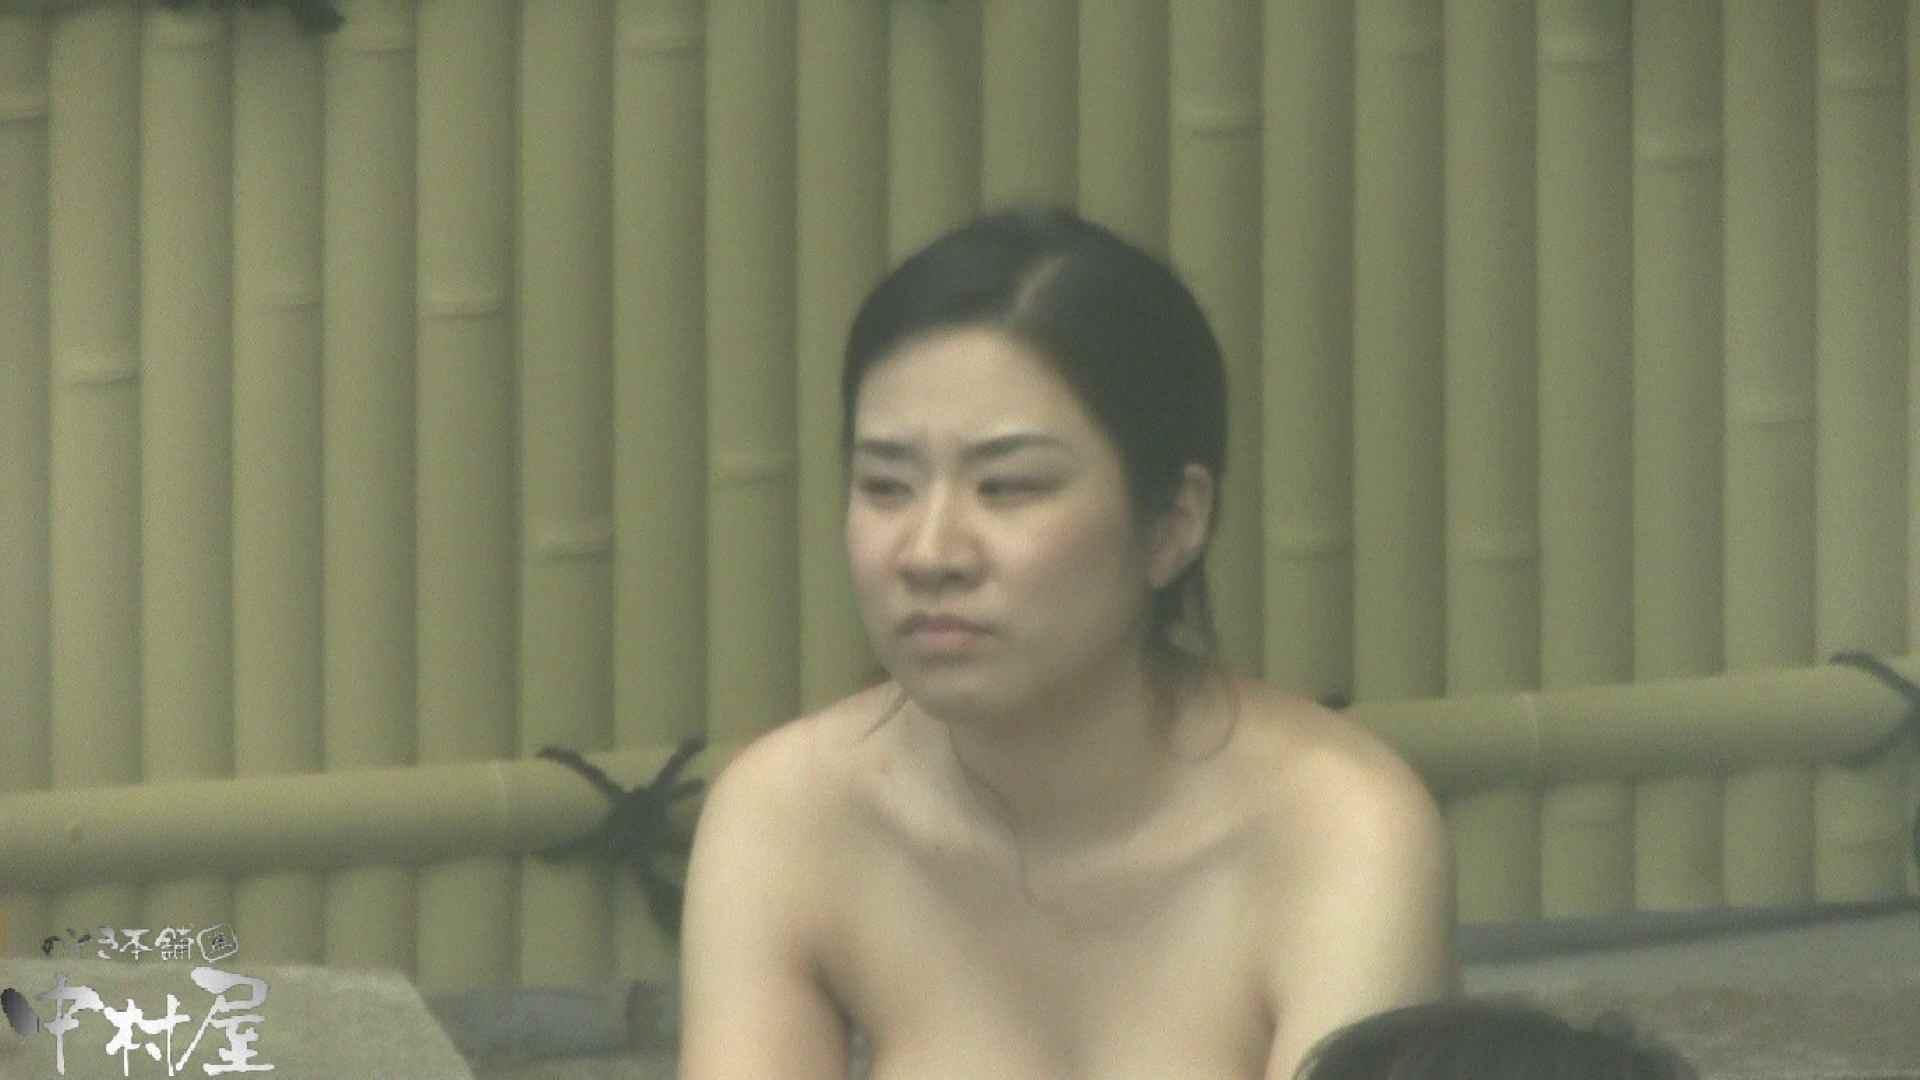 Aquaな露天風呂Vol.913 OLのエロ生活 すけべAV動画紹介 68連発 47